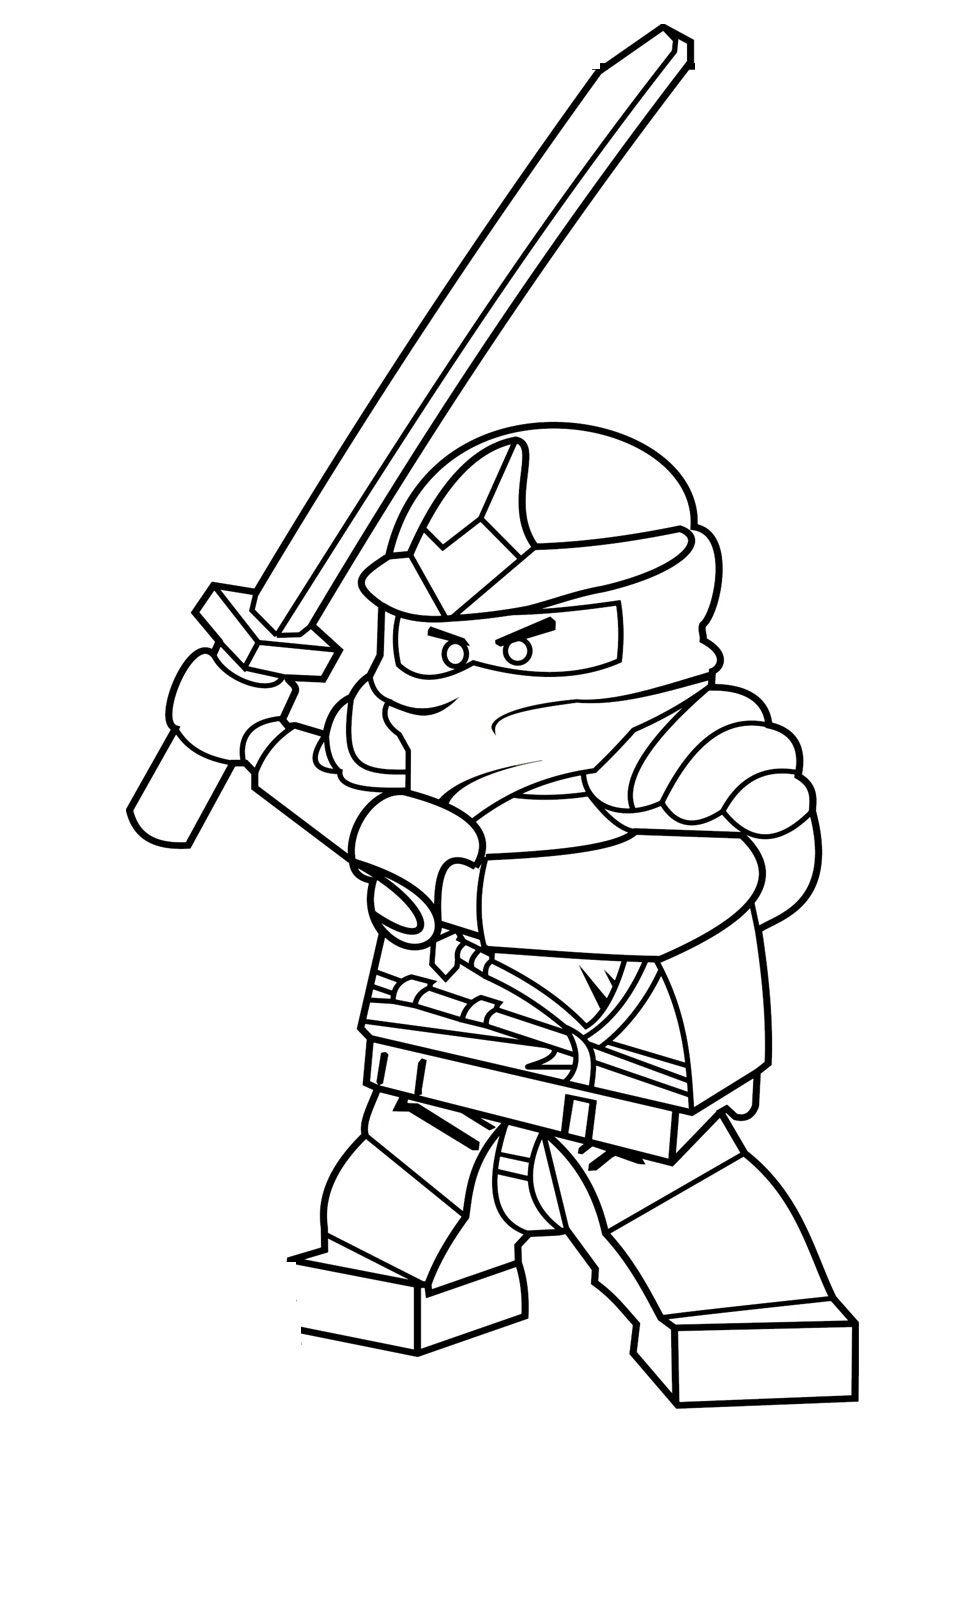 Free Printable Ninjago Coloring Pages For Kids Ninjago Coloring